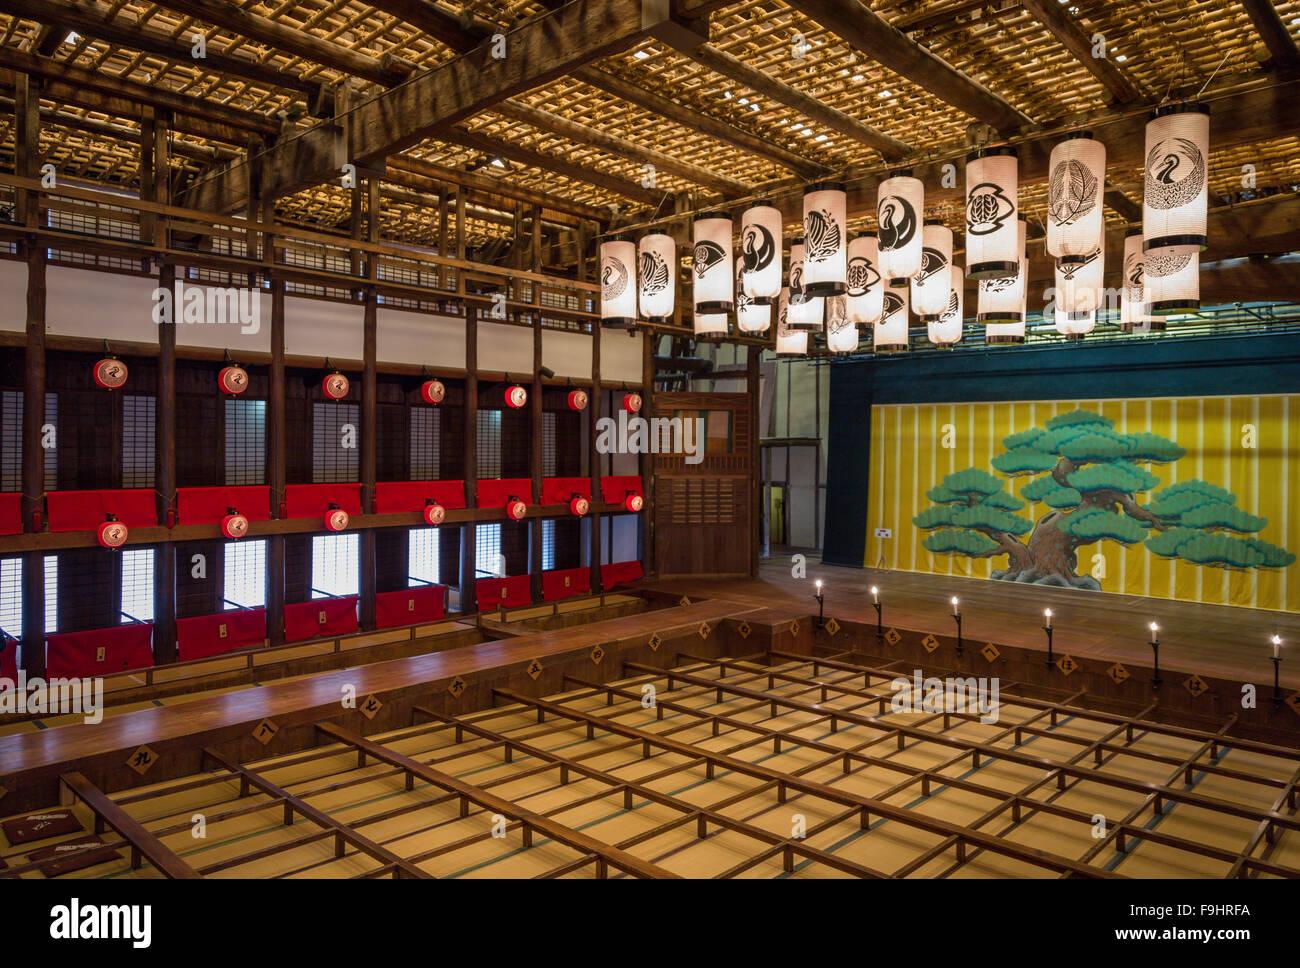 INTERIOR VIEW, KOMPIRA OSHIBAI KABUKI THEATER (1835)           KOTOHIRA          JAPAN - Stock Image